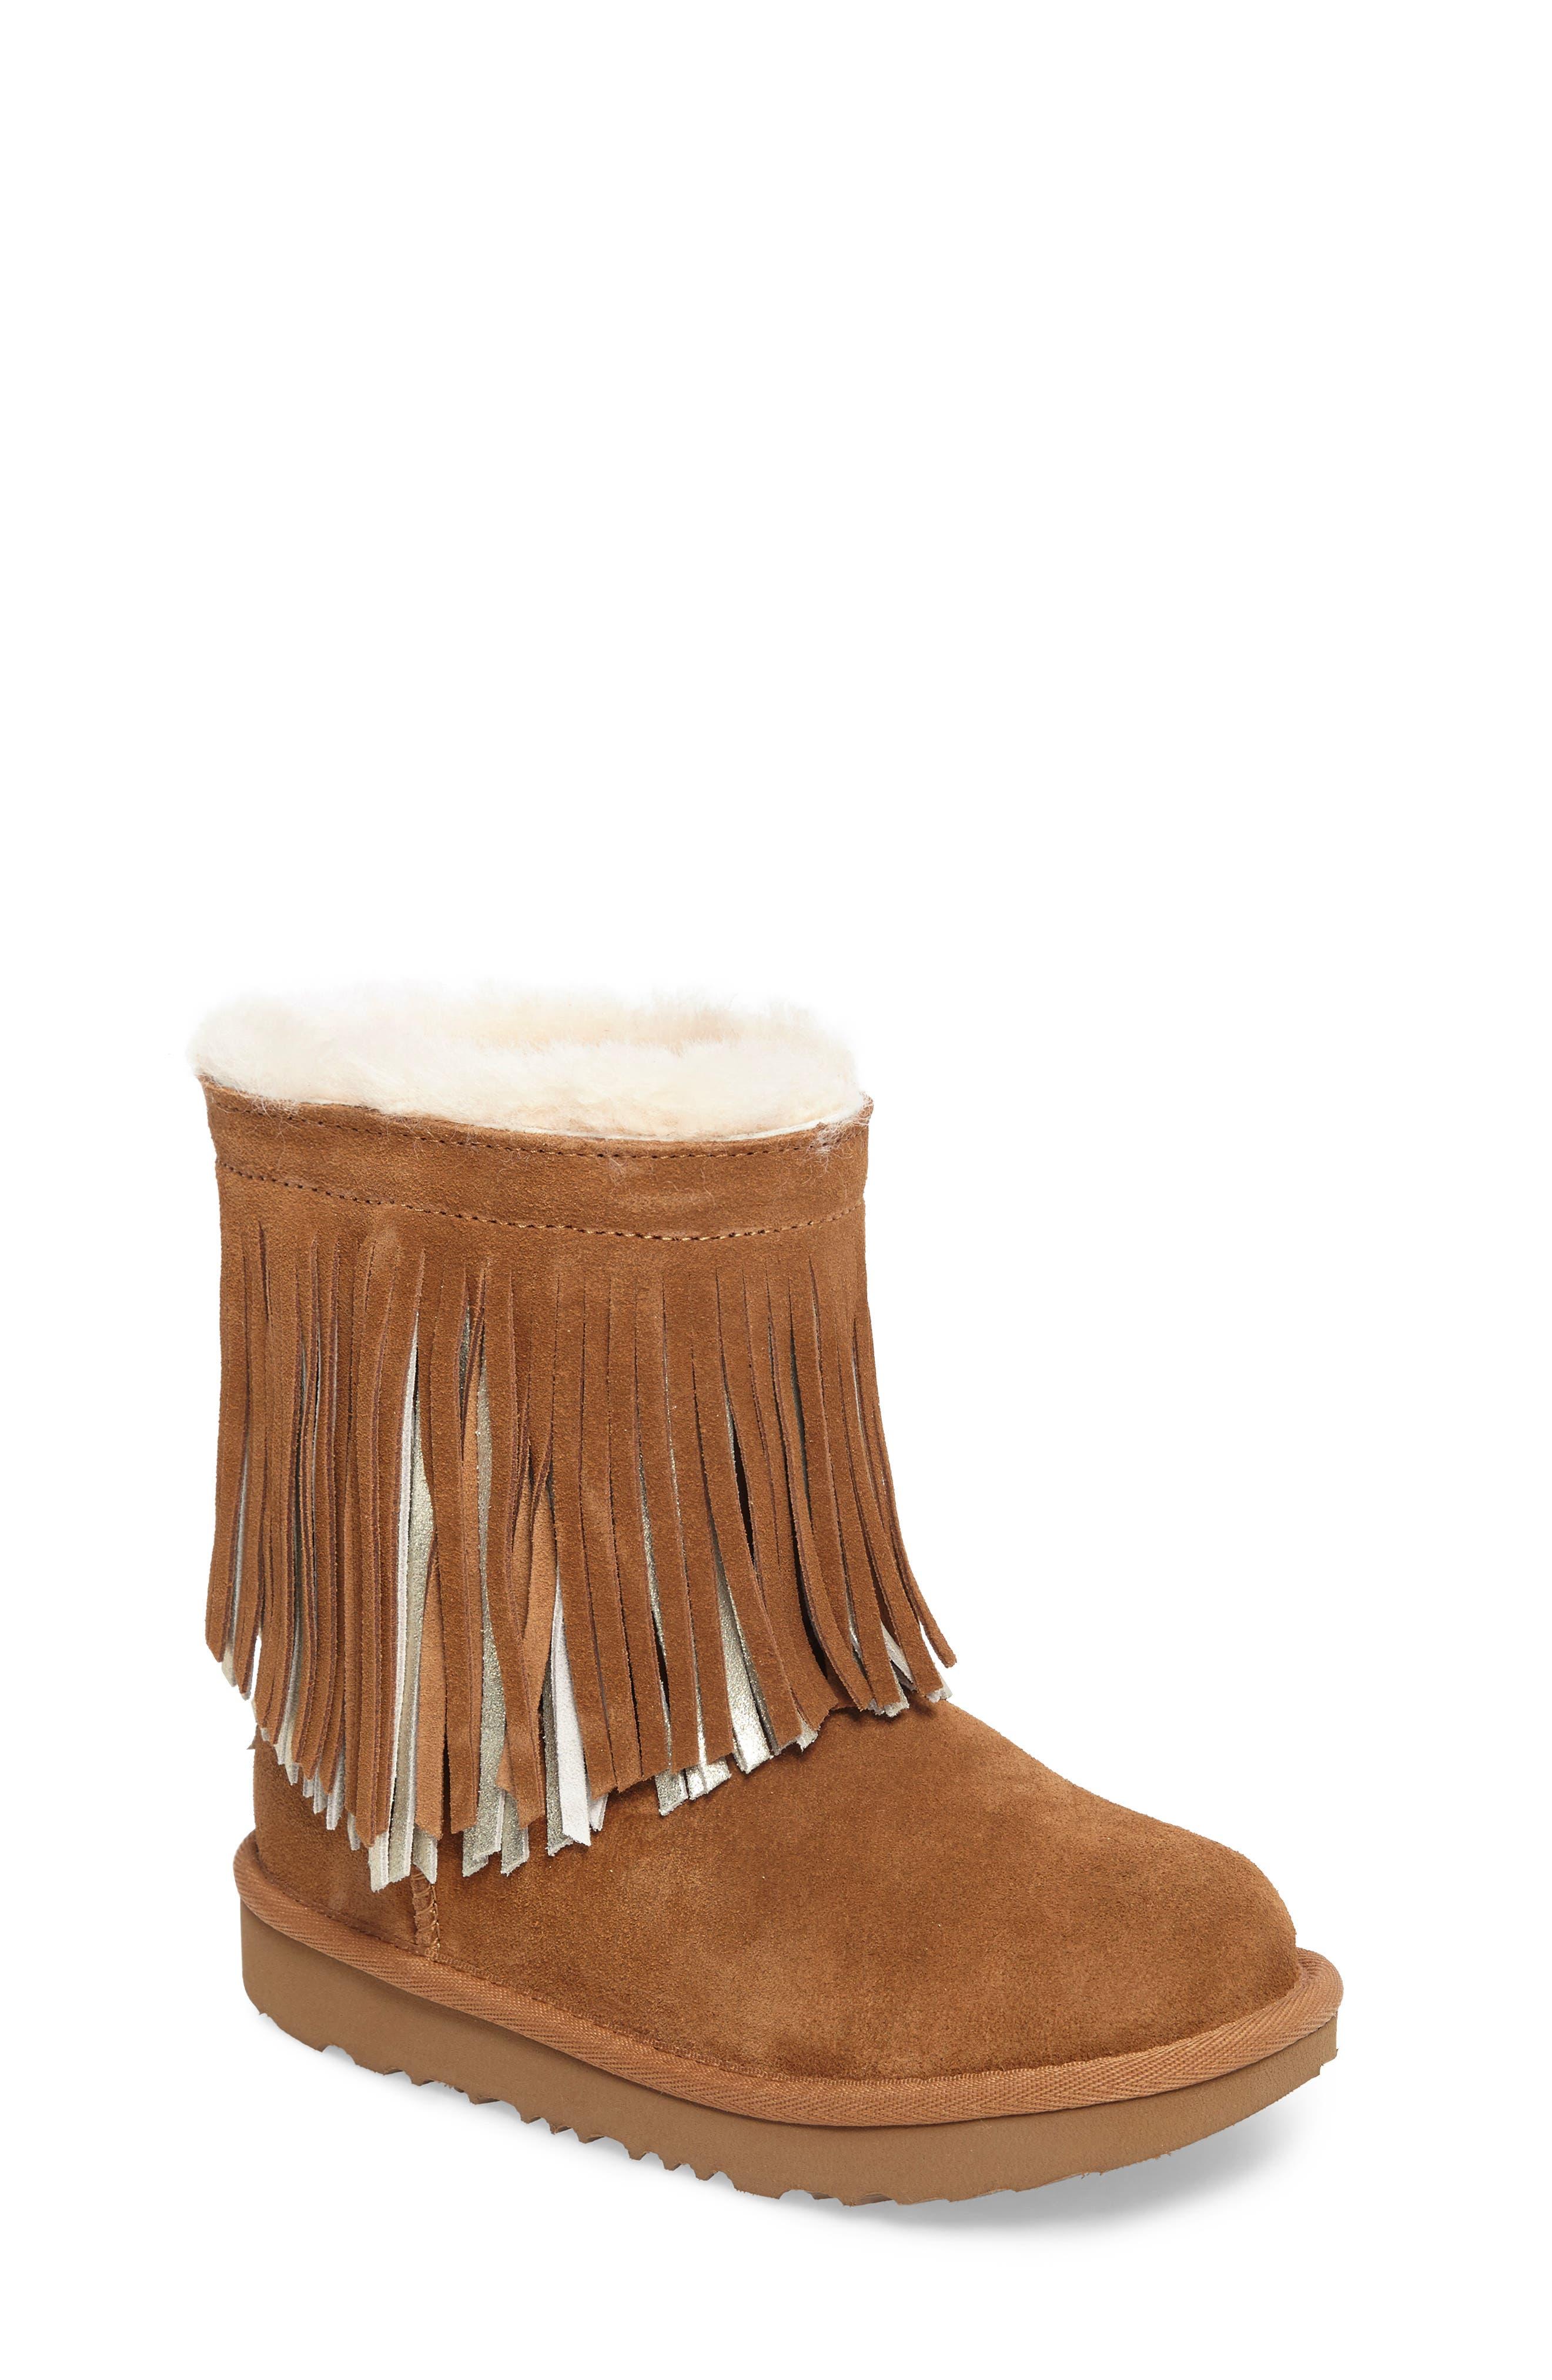 Main Image - UGG® Classic II Short Fringe Water Resistant Genuine Shearling Boot (Walker, Toddler, Little Kid & Big Kid)